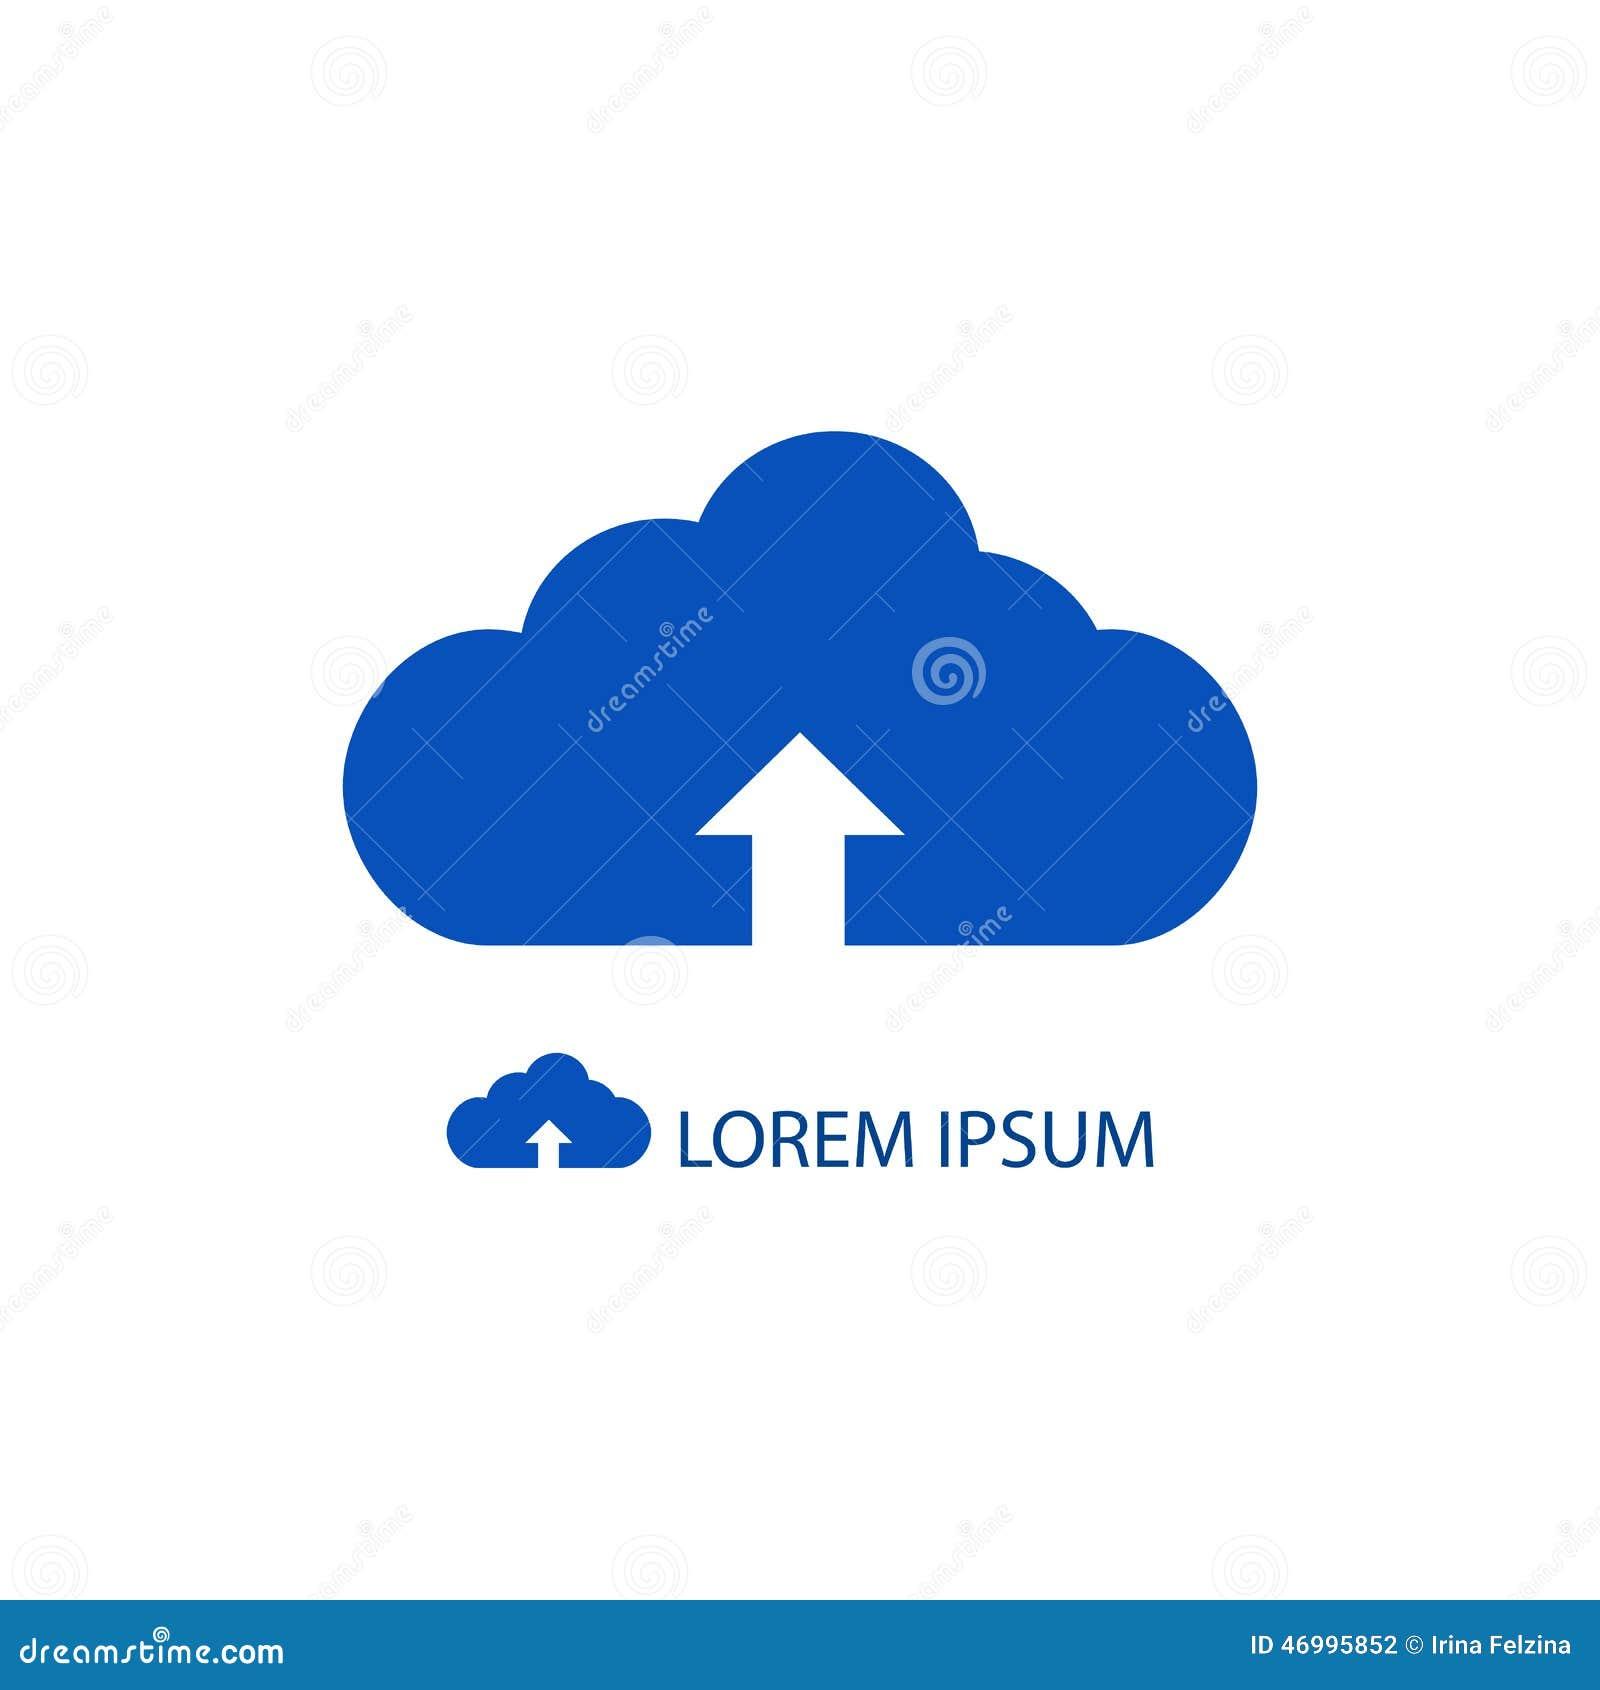 image logo nuage bleu